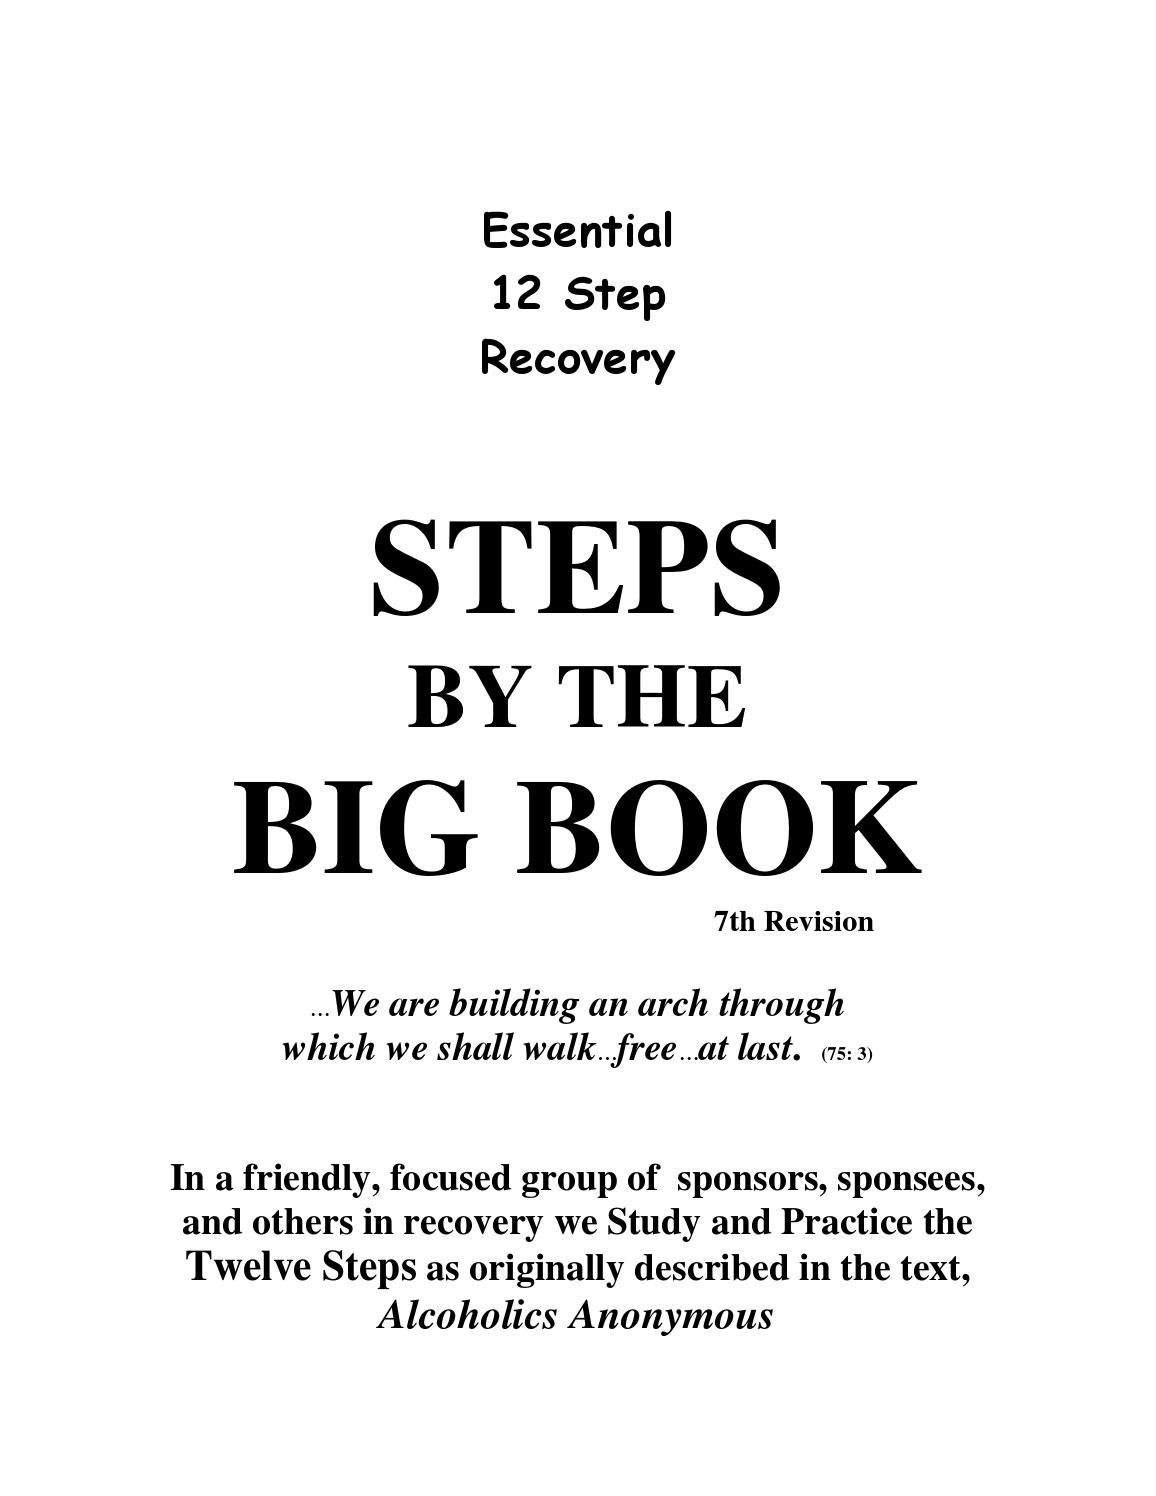 Workbooks recovery dynamics worksheets : Denverdonate com essential 12 step recovery steps for the big book ...